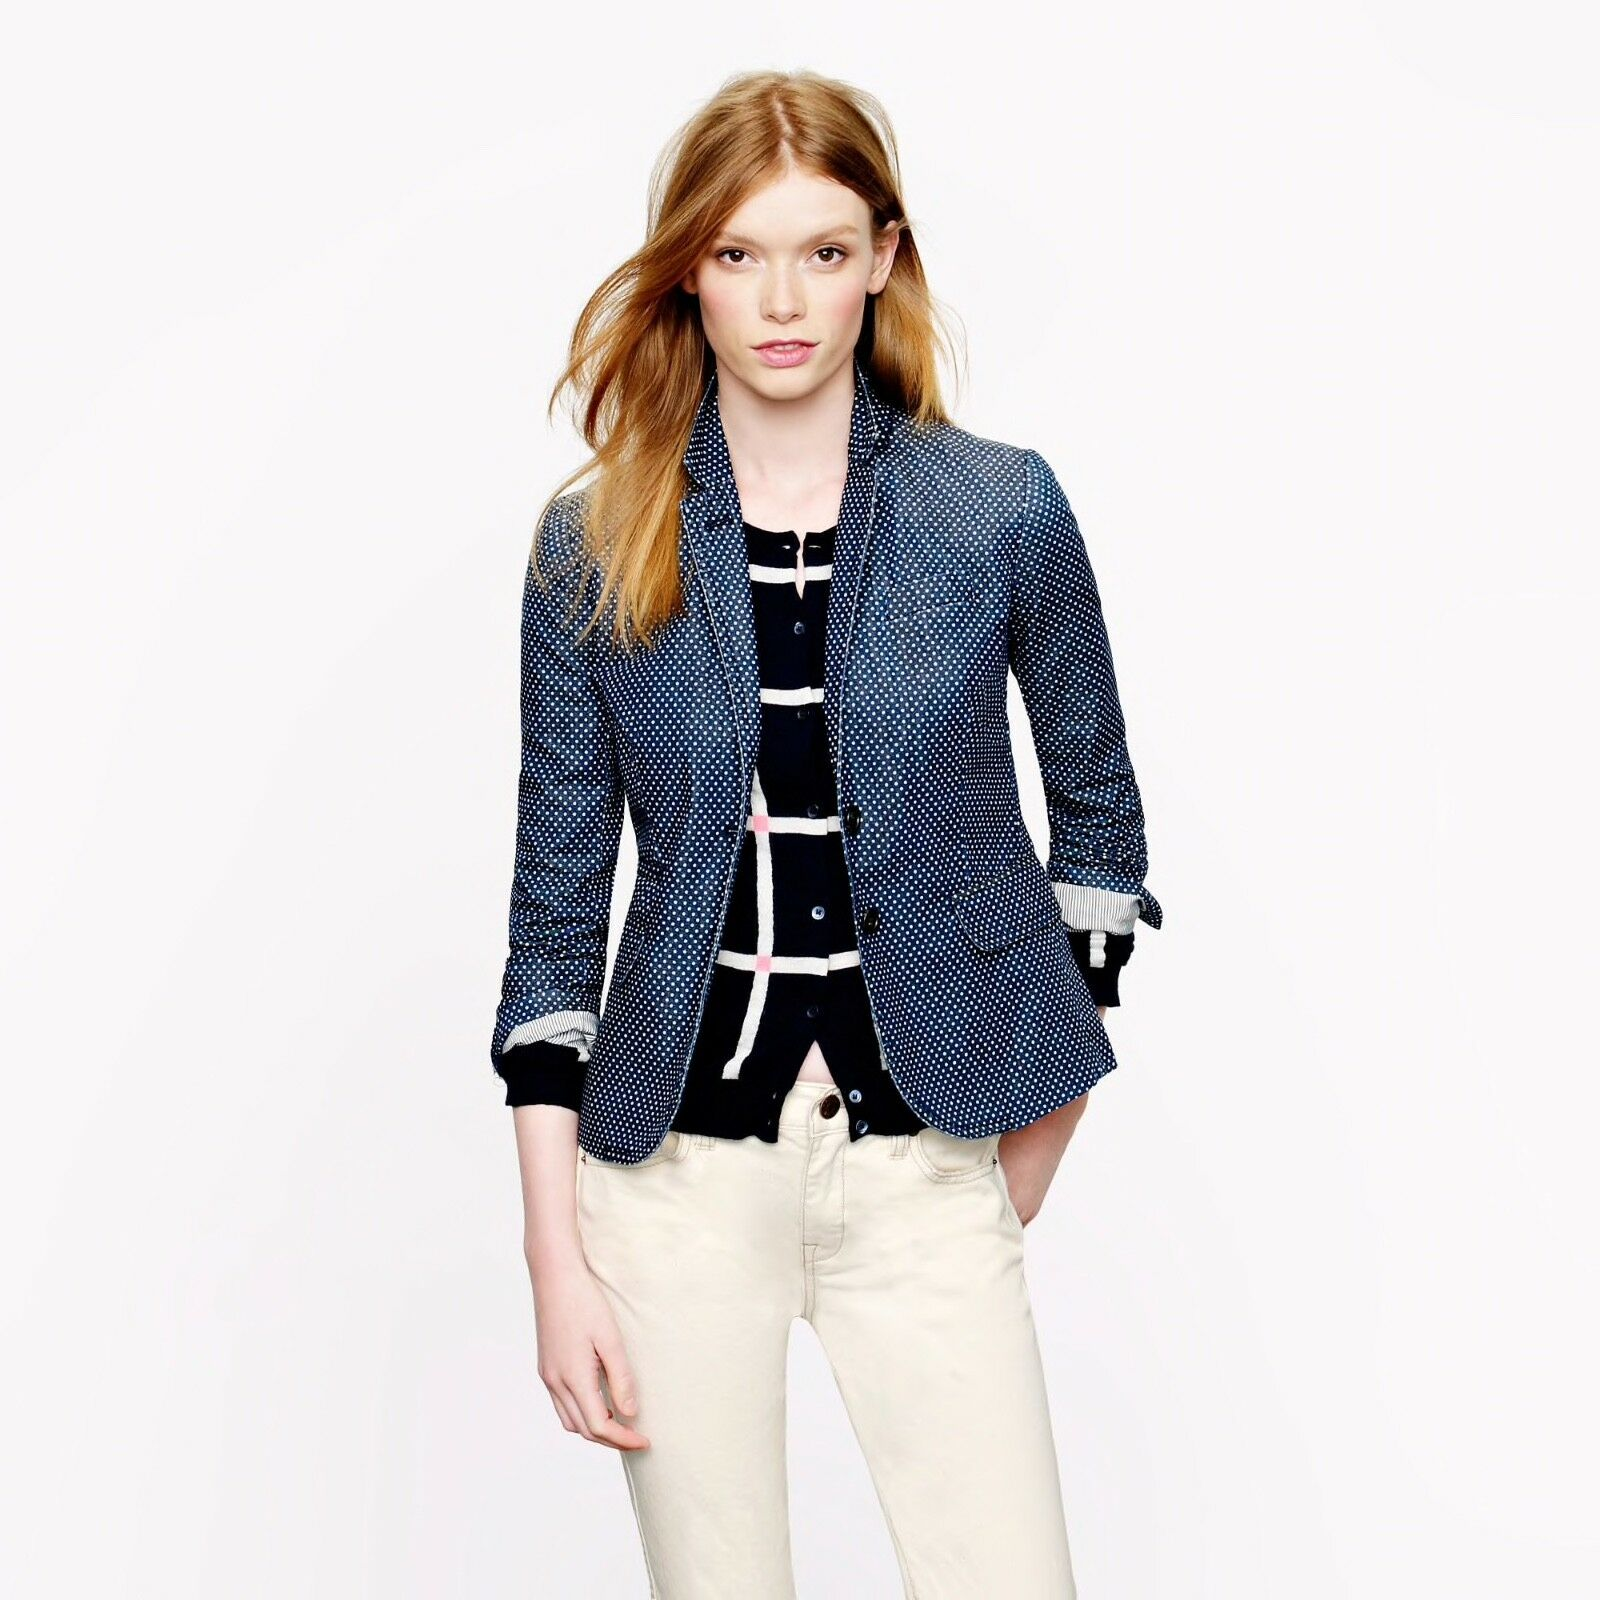 NWT J CREW Classic schoolboy blazer in indigo polka dot, Size 2,